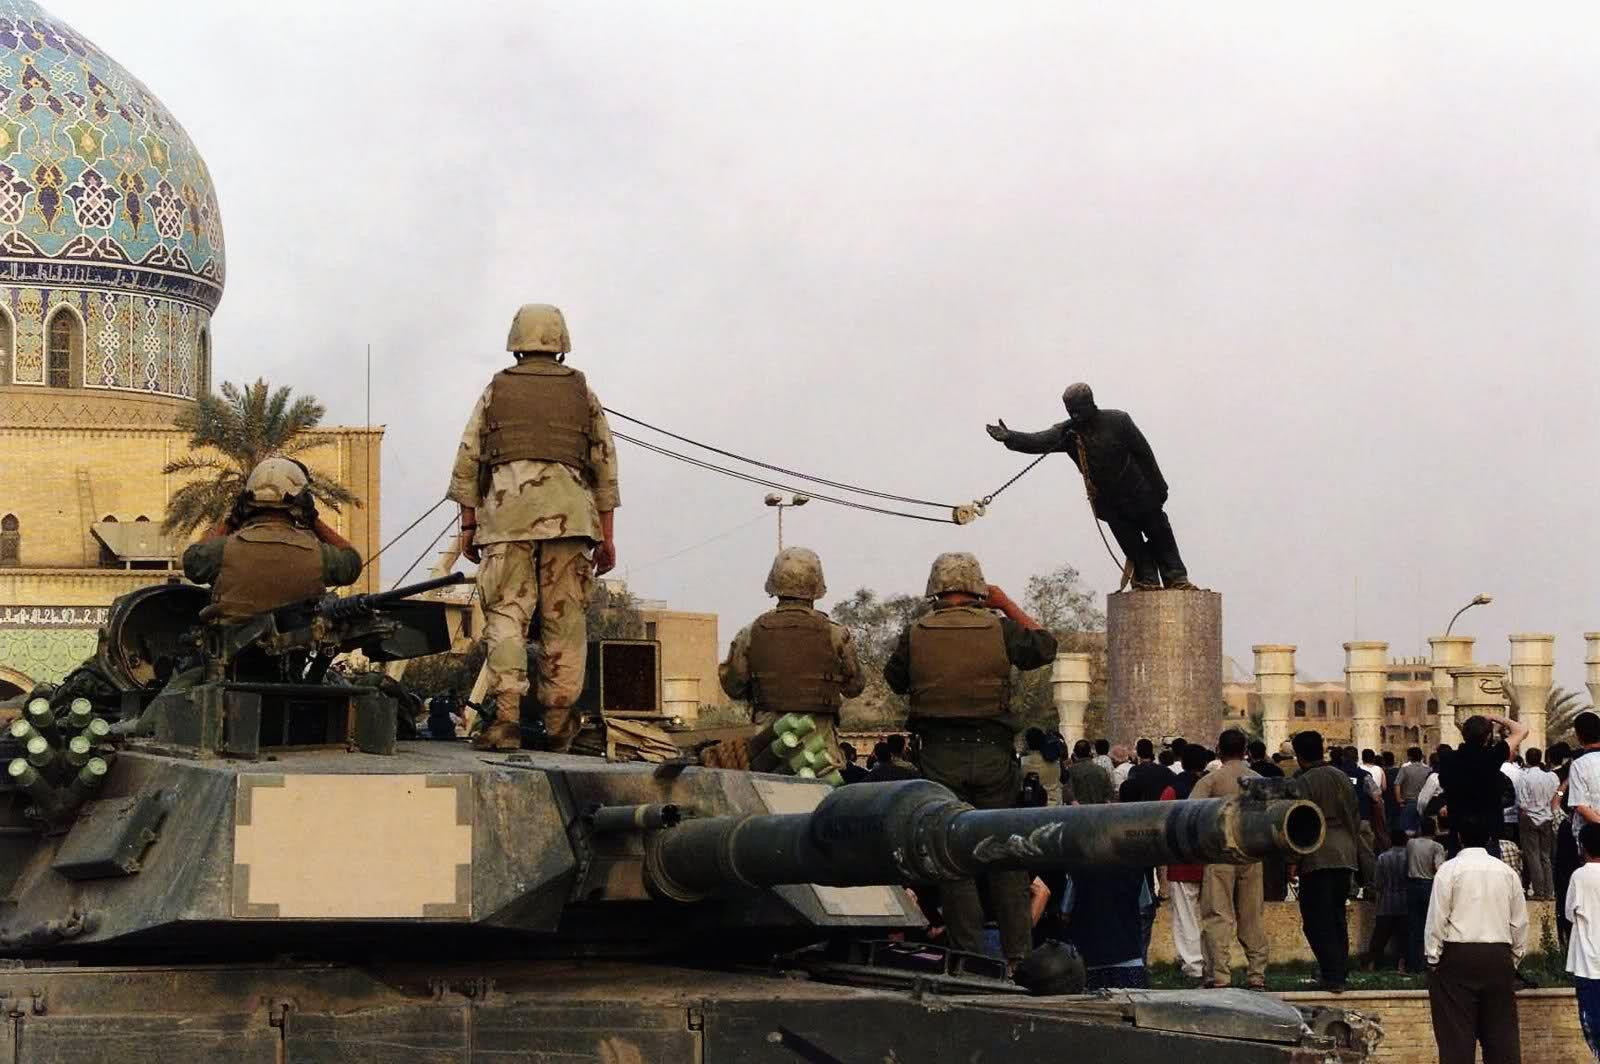 ¿Estuviste o estás de acuerdo con la intervención de España en Irak?